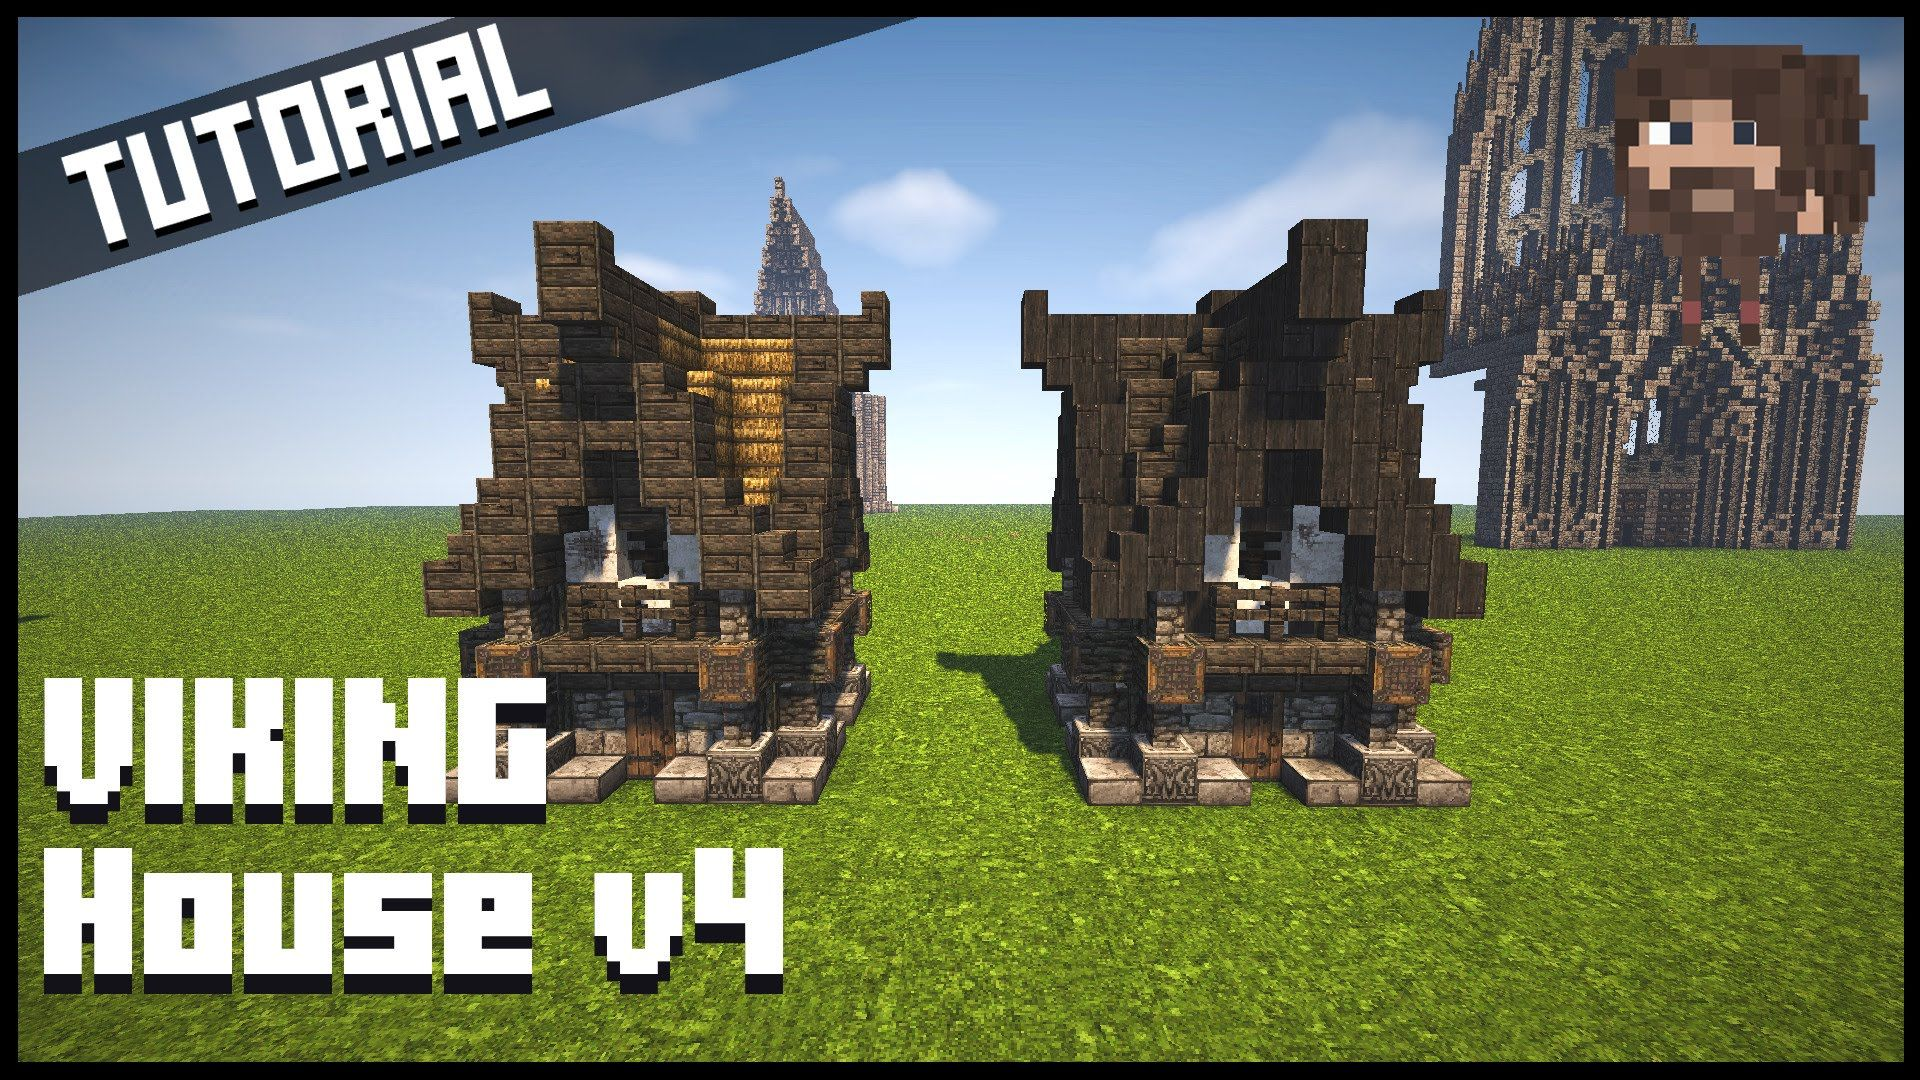 Minecraft tutorial vikingehus viking house v4